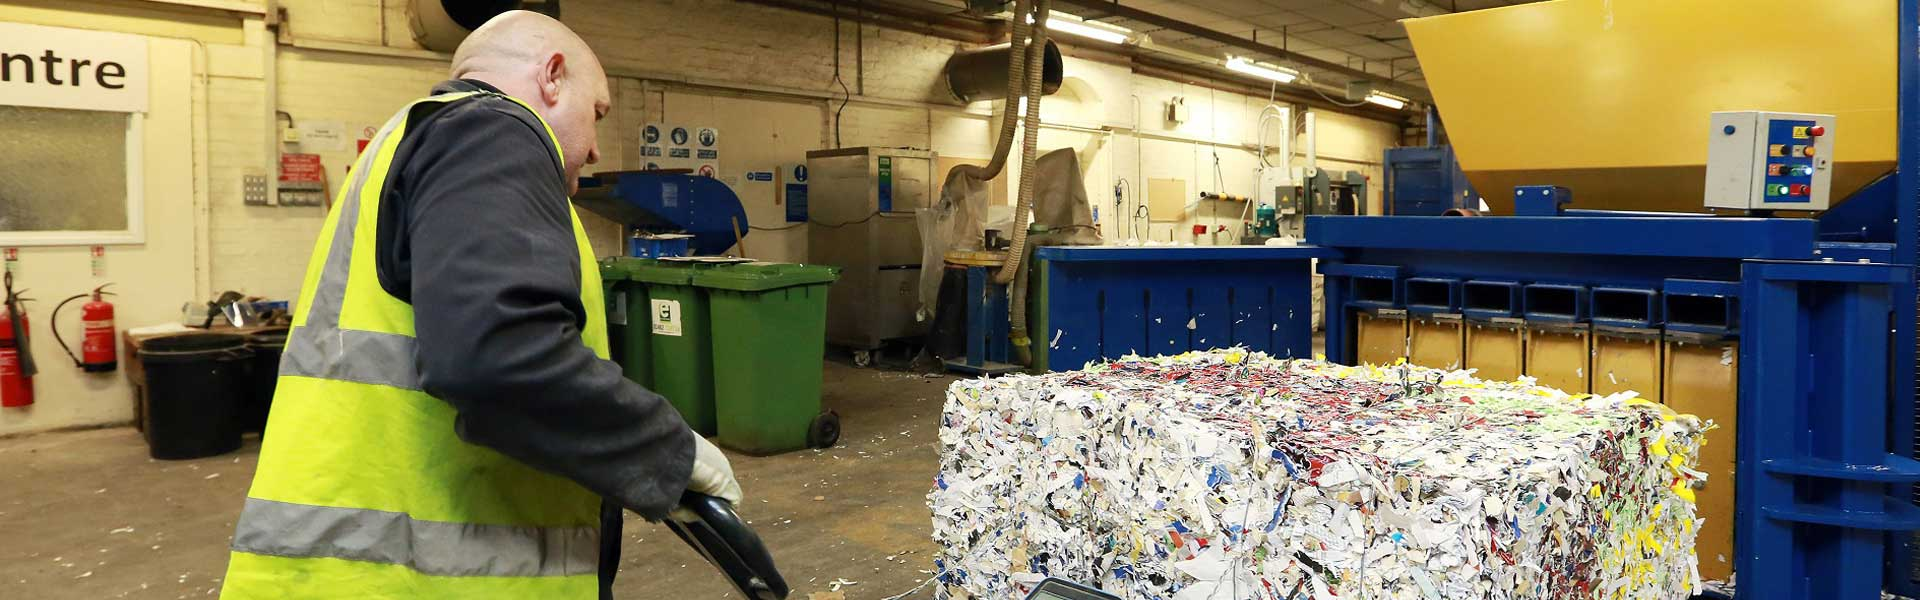 UK's largest single importer of produce owns Riverside fleet of waste balers